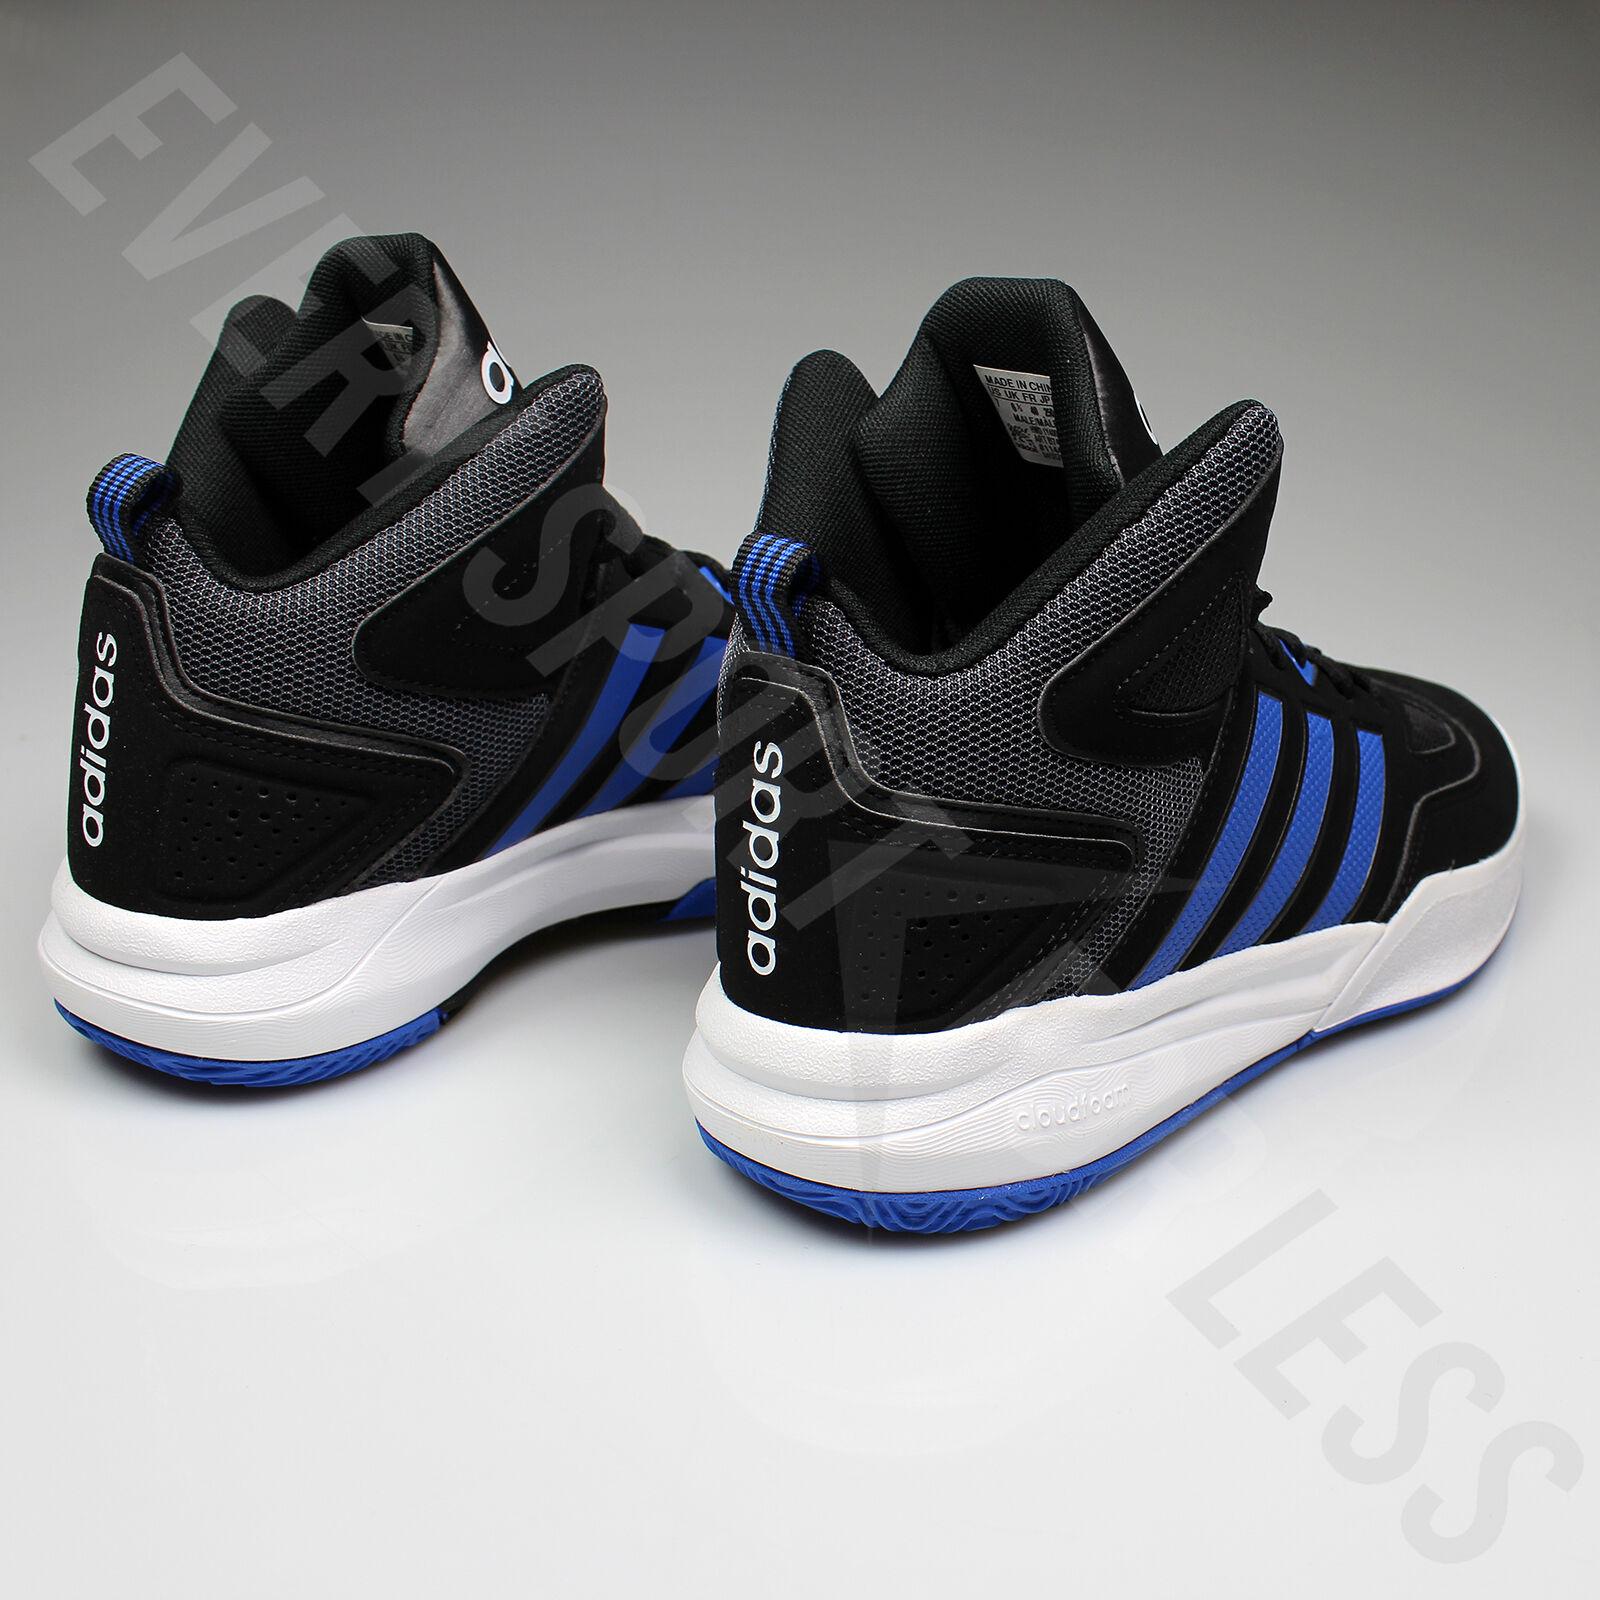 the best attitude da582 13bf2 ... Men s Men s Men s New Balance NLock loog Athletic Training Shoes - Size  10 - White 316dce ...